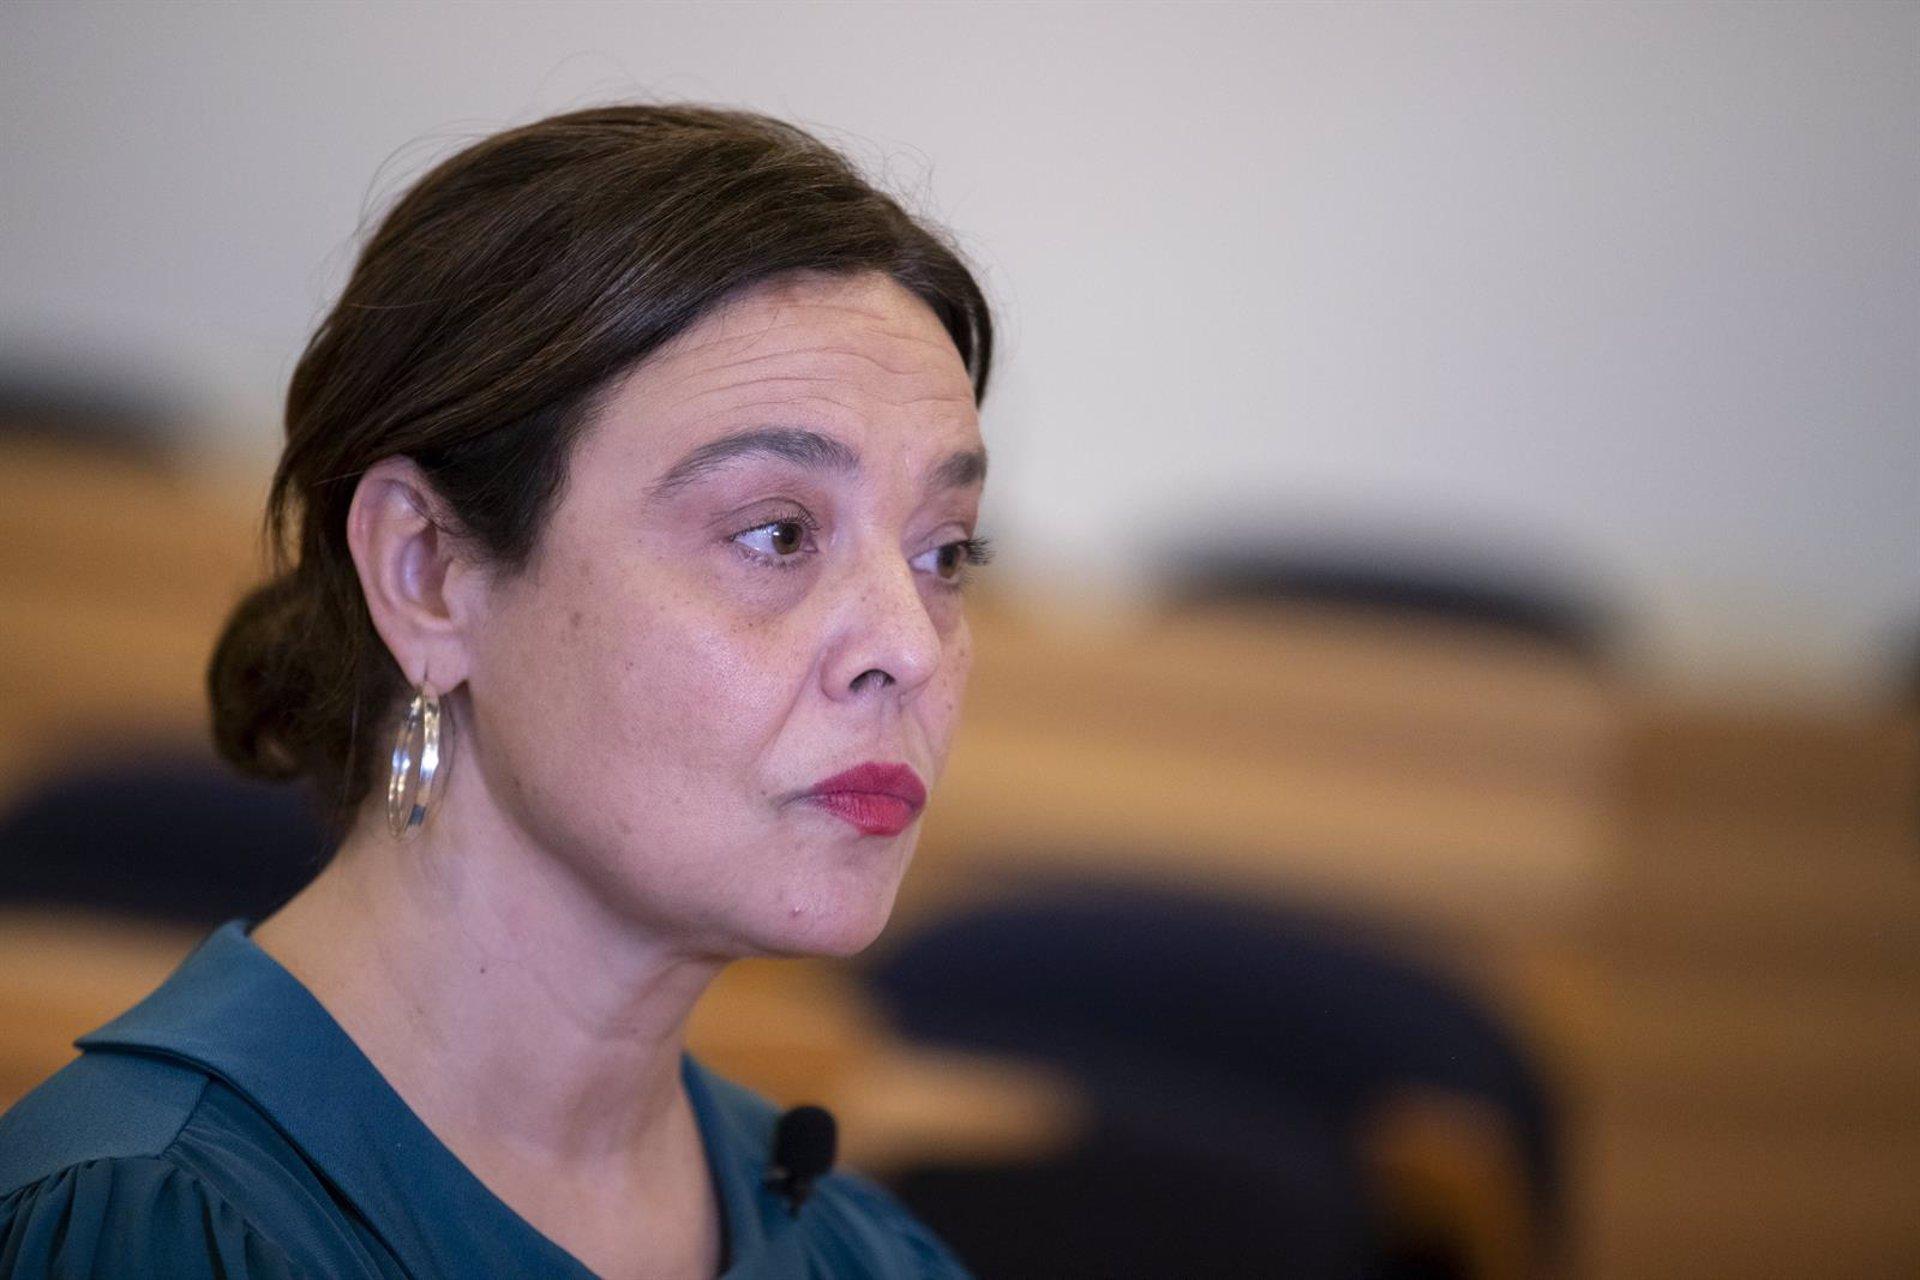 La alcaldesa de Ciudad Real, Pilar Zamora. Foto: Europa Press.